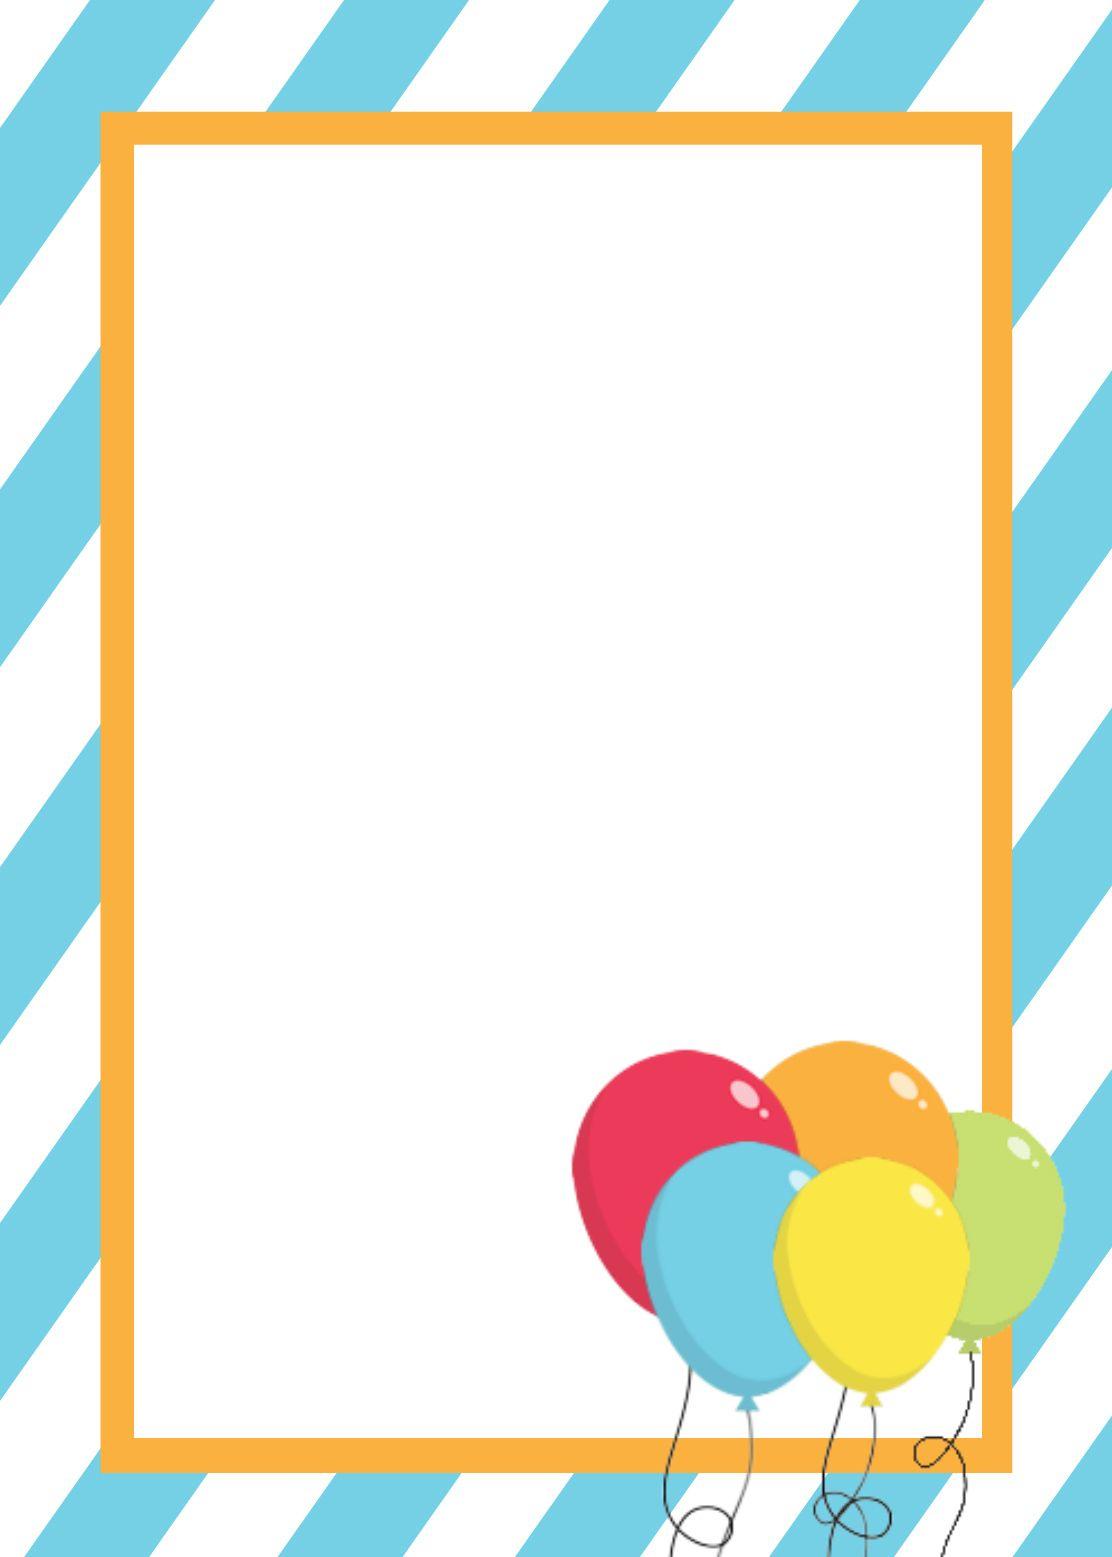 Free Printable Birthday Invitation Templates | Birthday Ideas And - Free Printable Princess Invitations